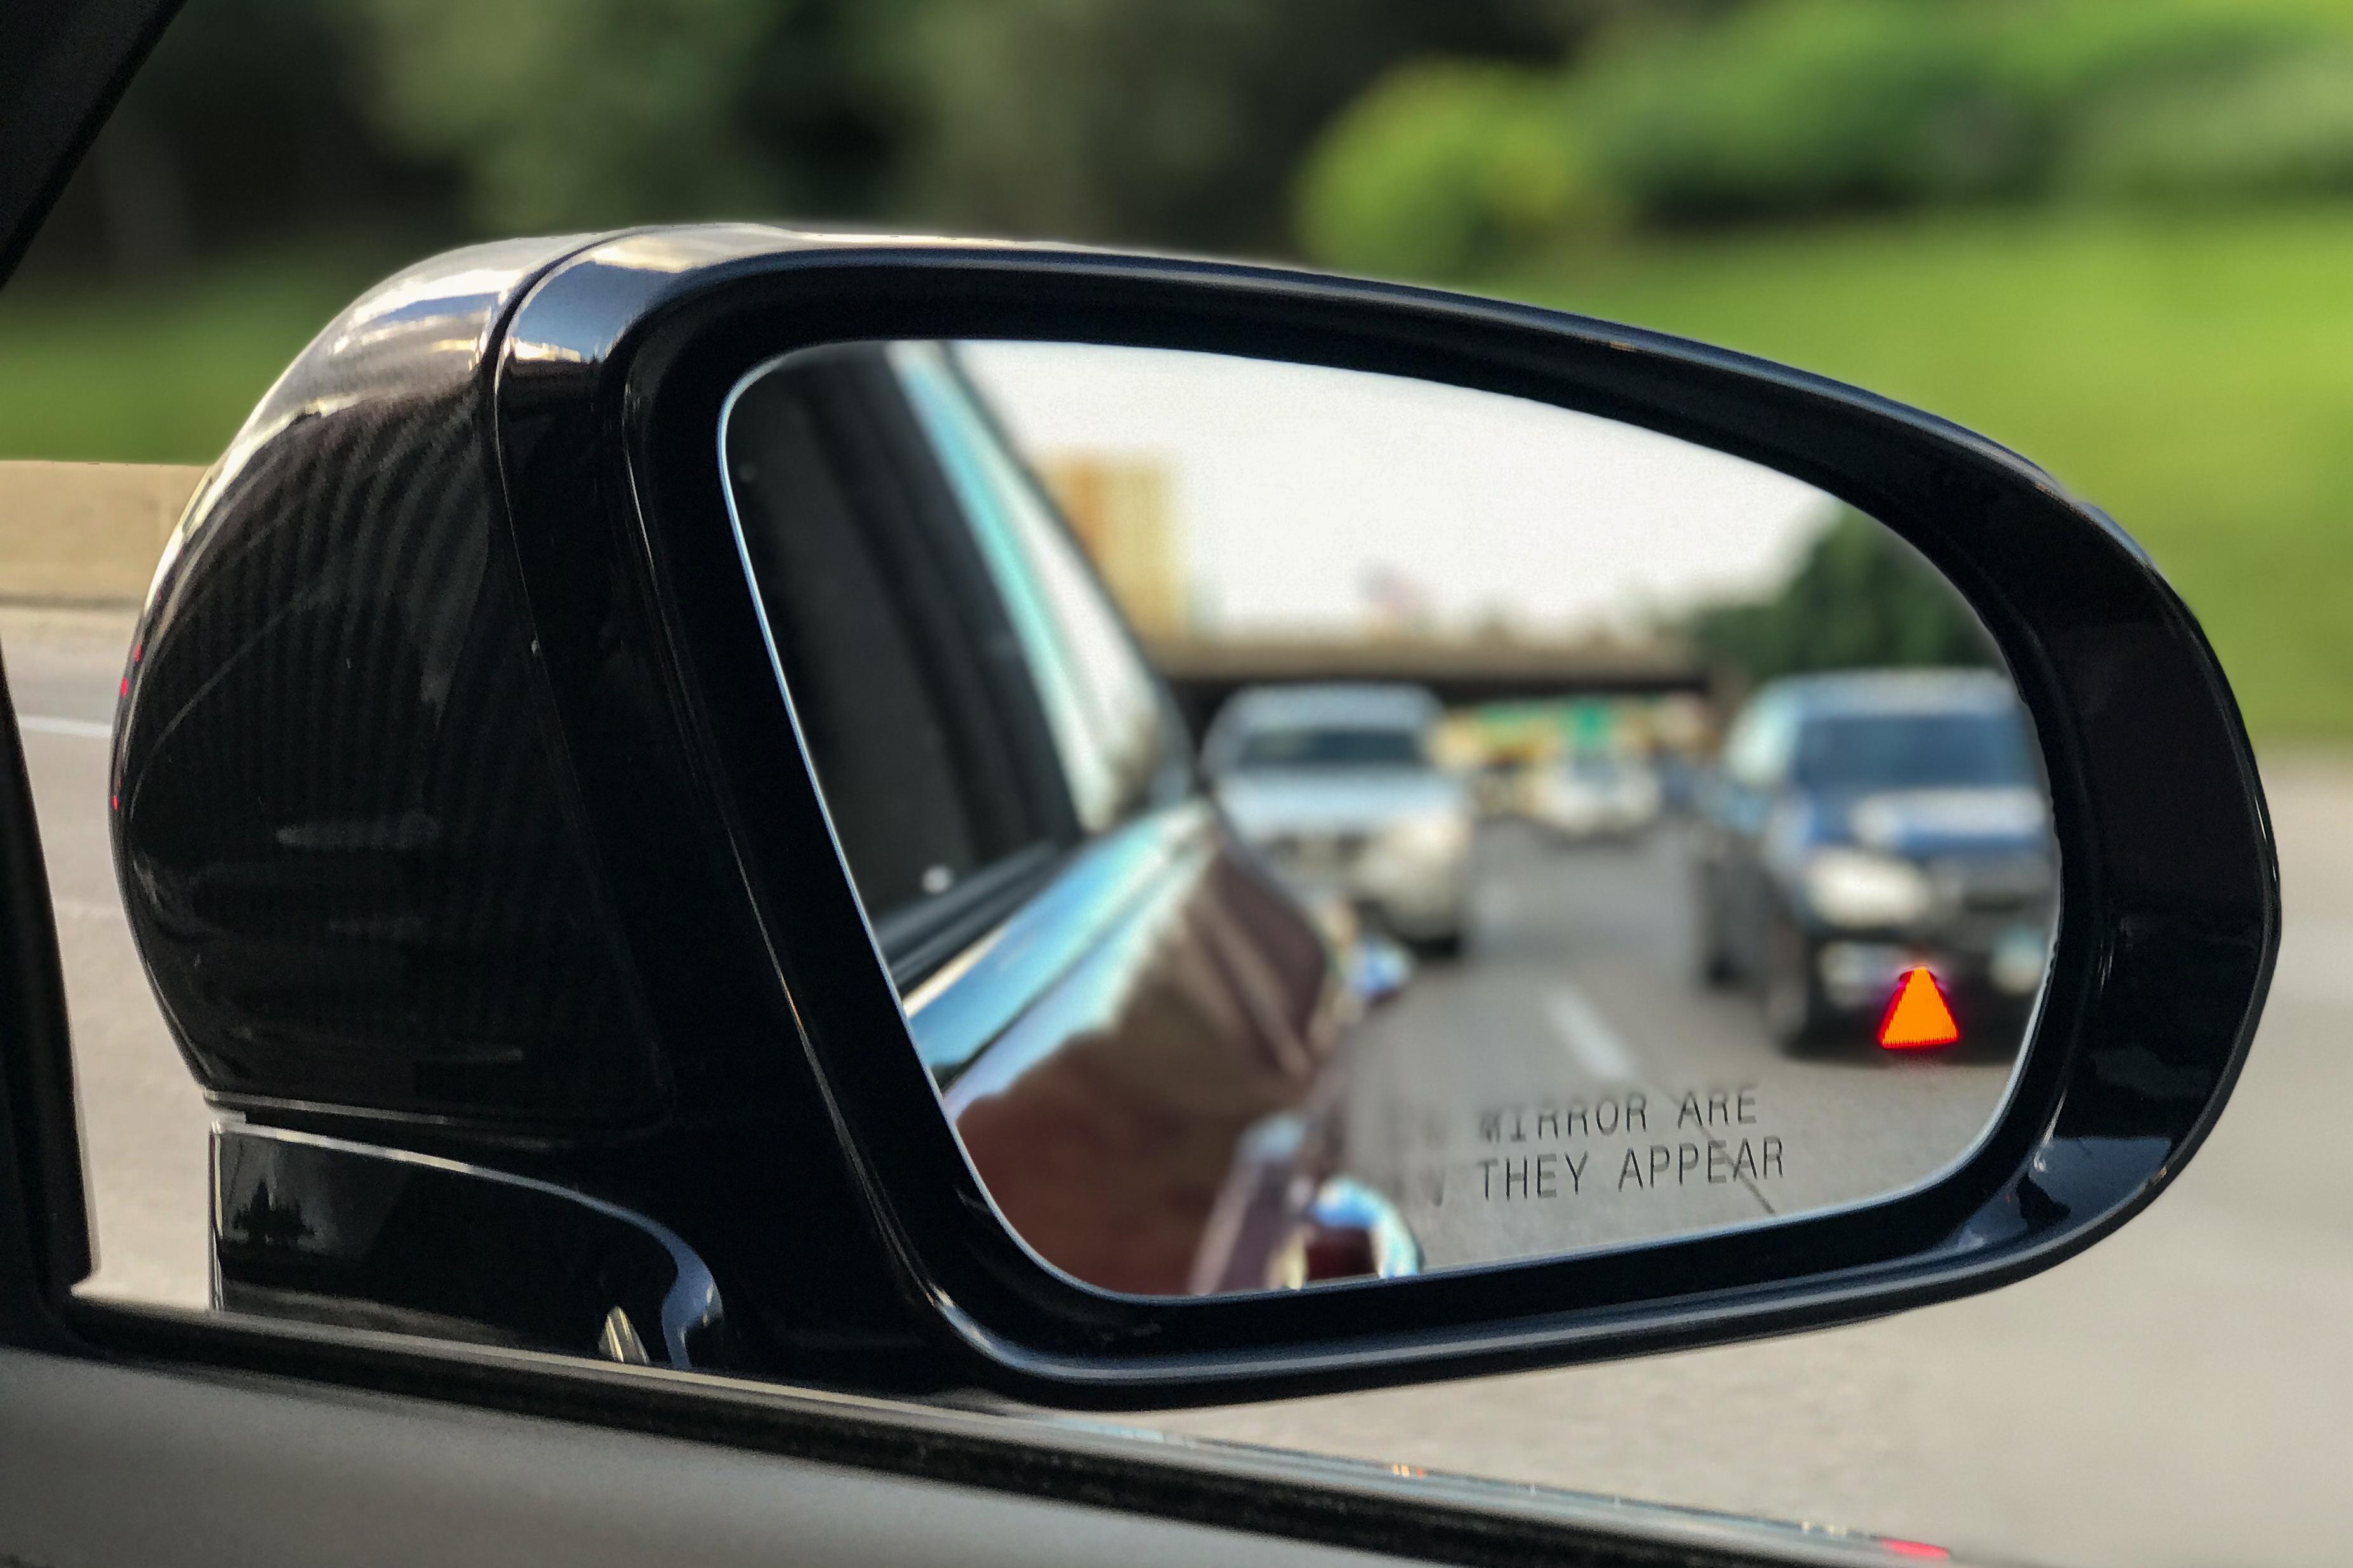 2019 Mercedes-AMG CLS53 Blind Spot Assist